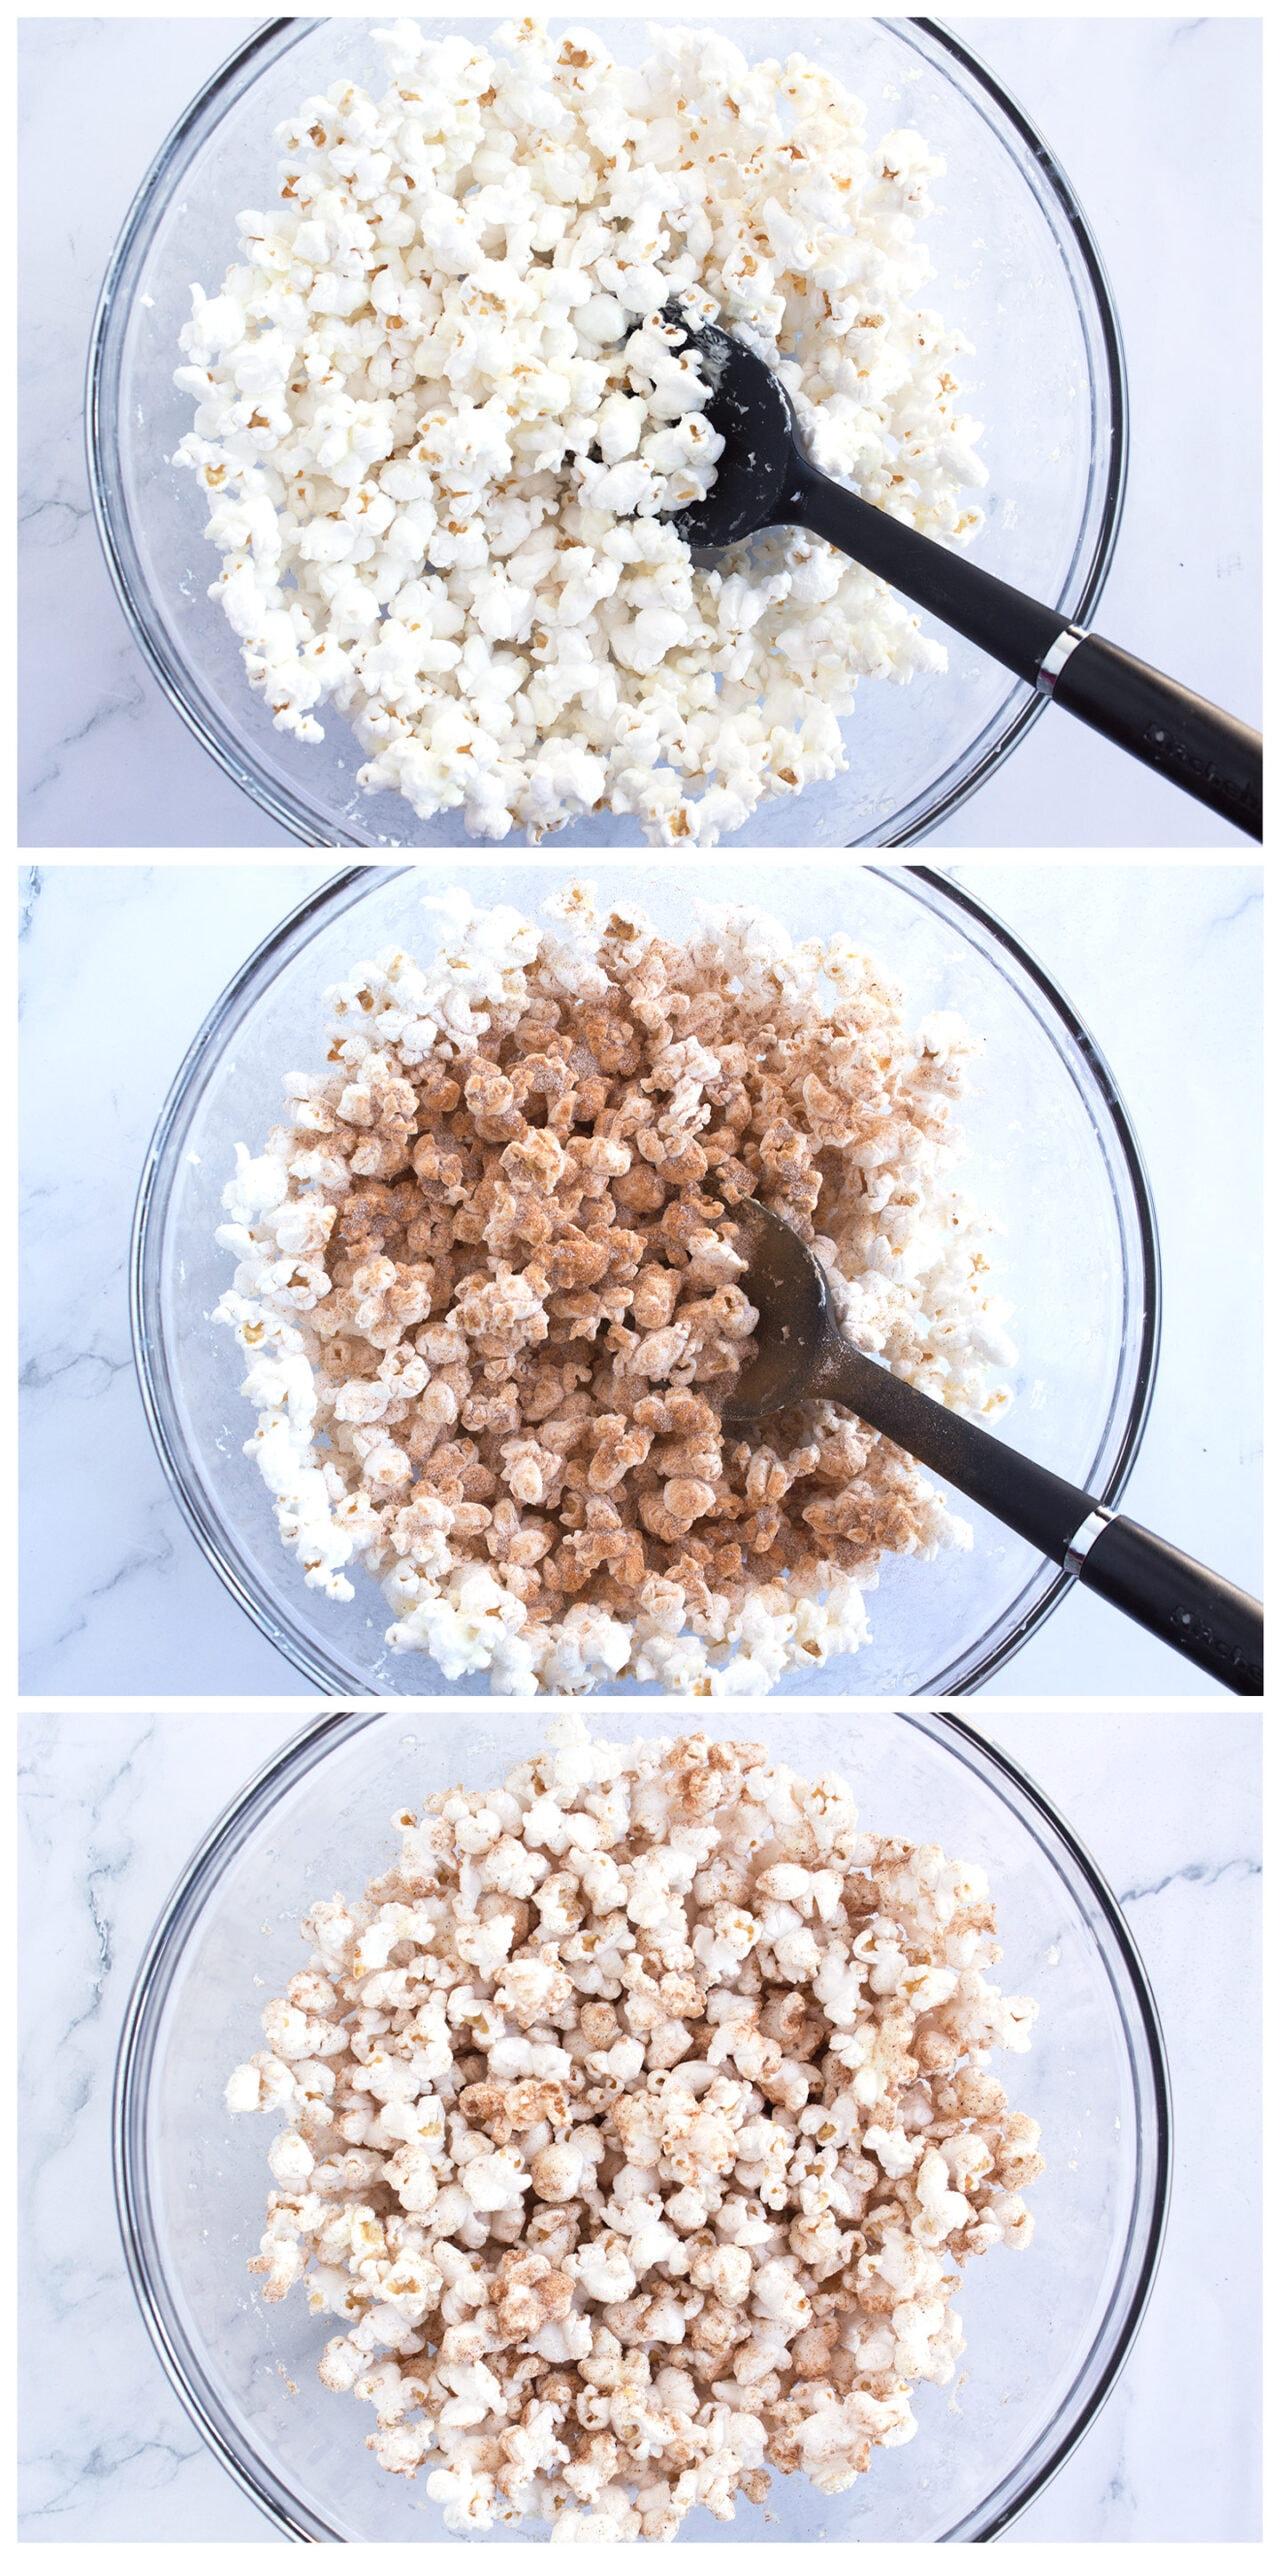 Steps 1, 2, and 3 to make White Chocolate Churro Popcorn